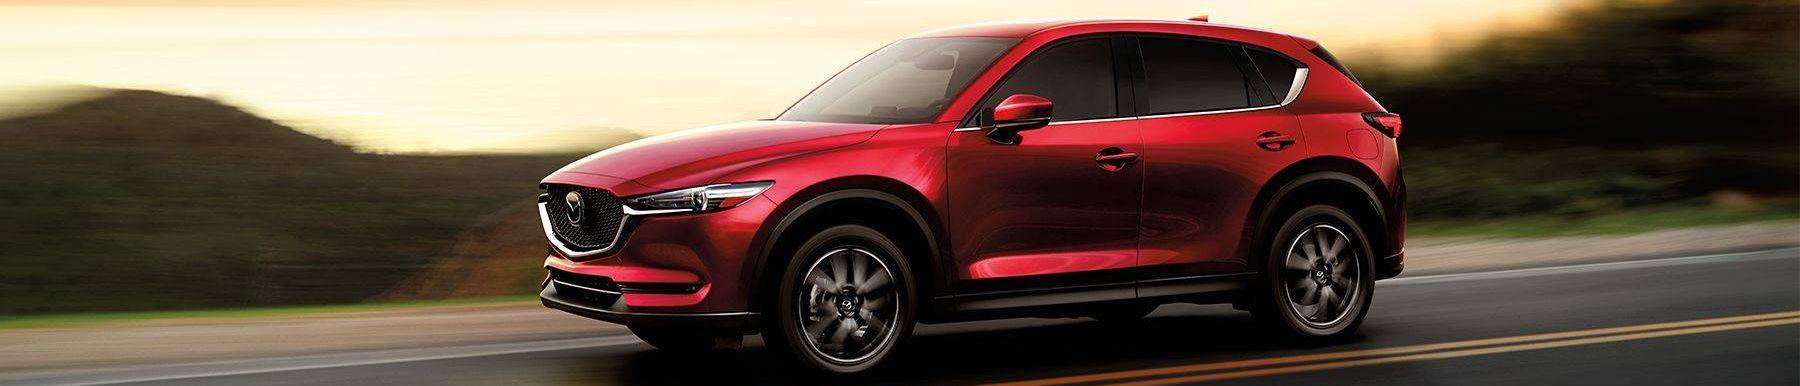 2018 Mazda CX-5 Financing near Temple, TX